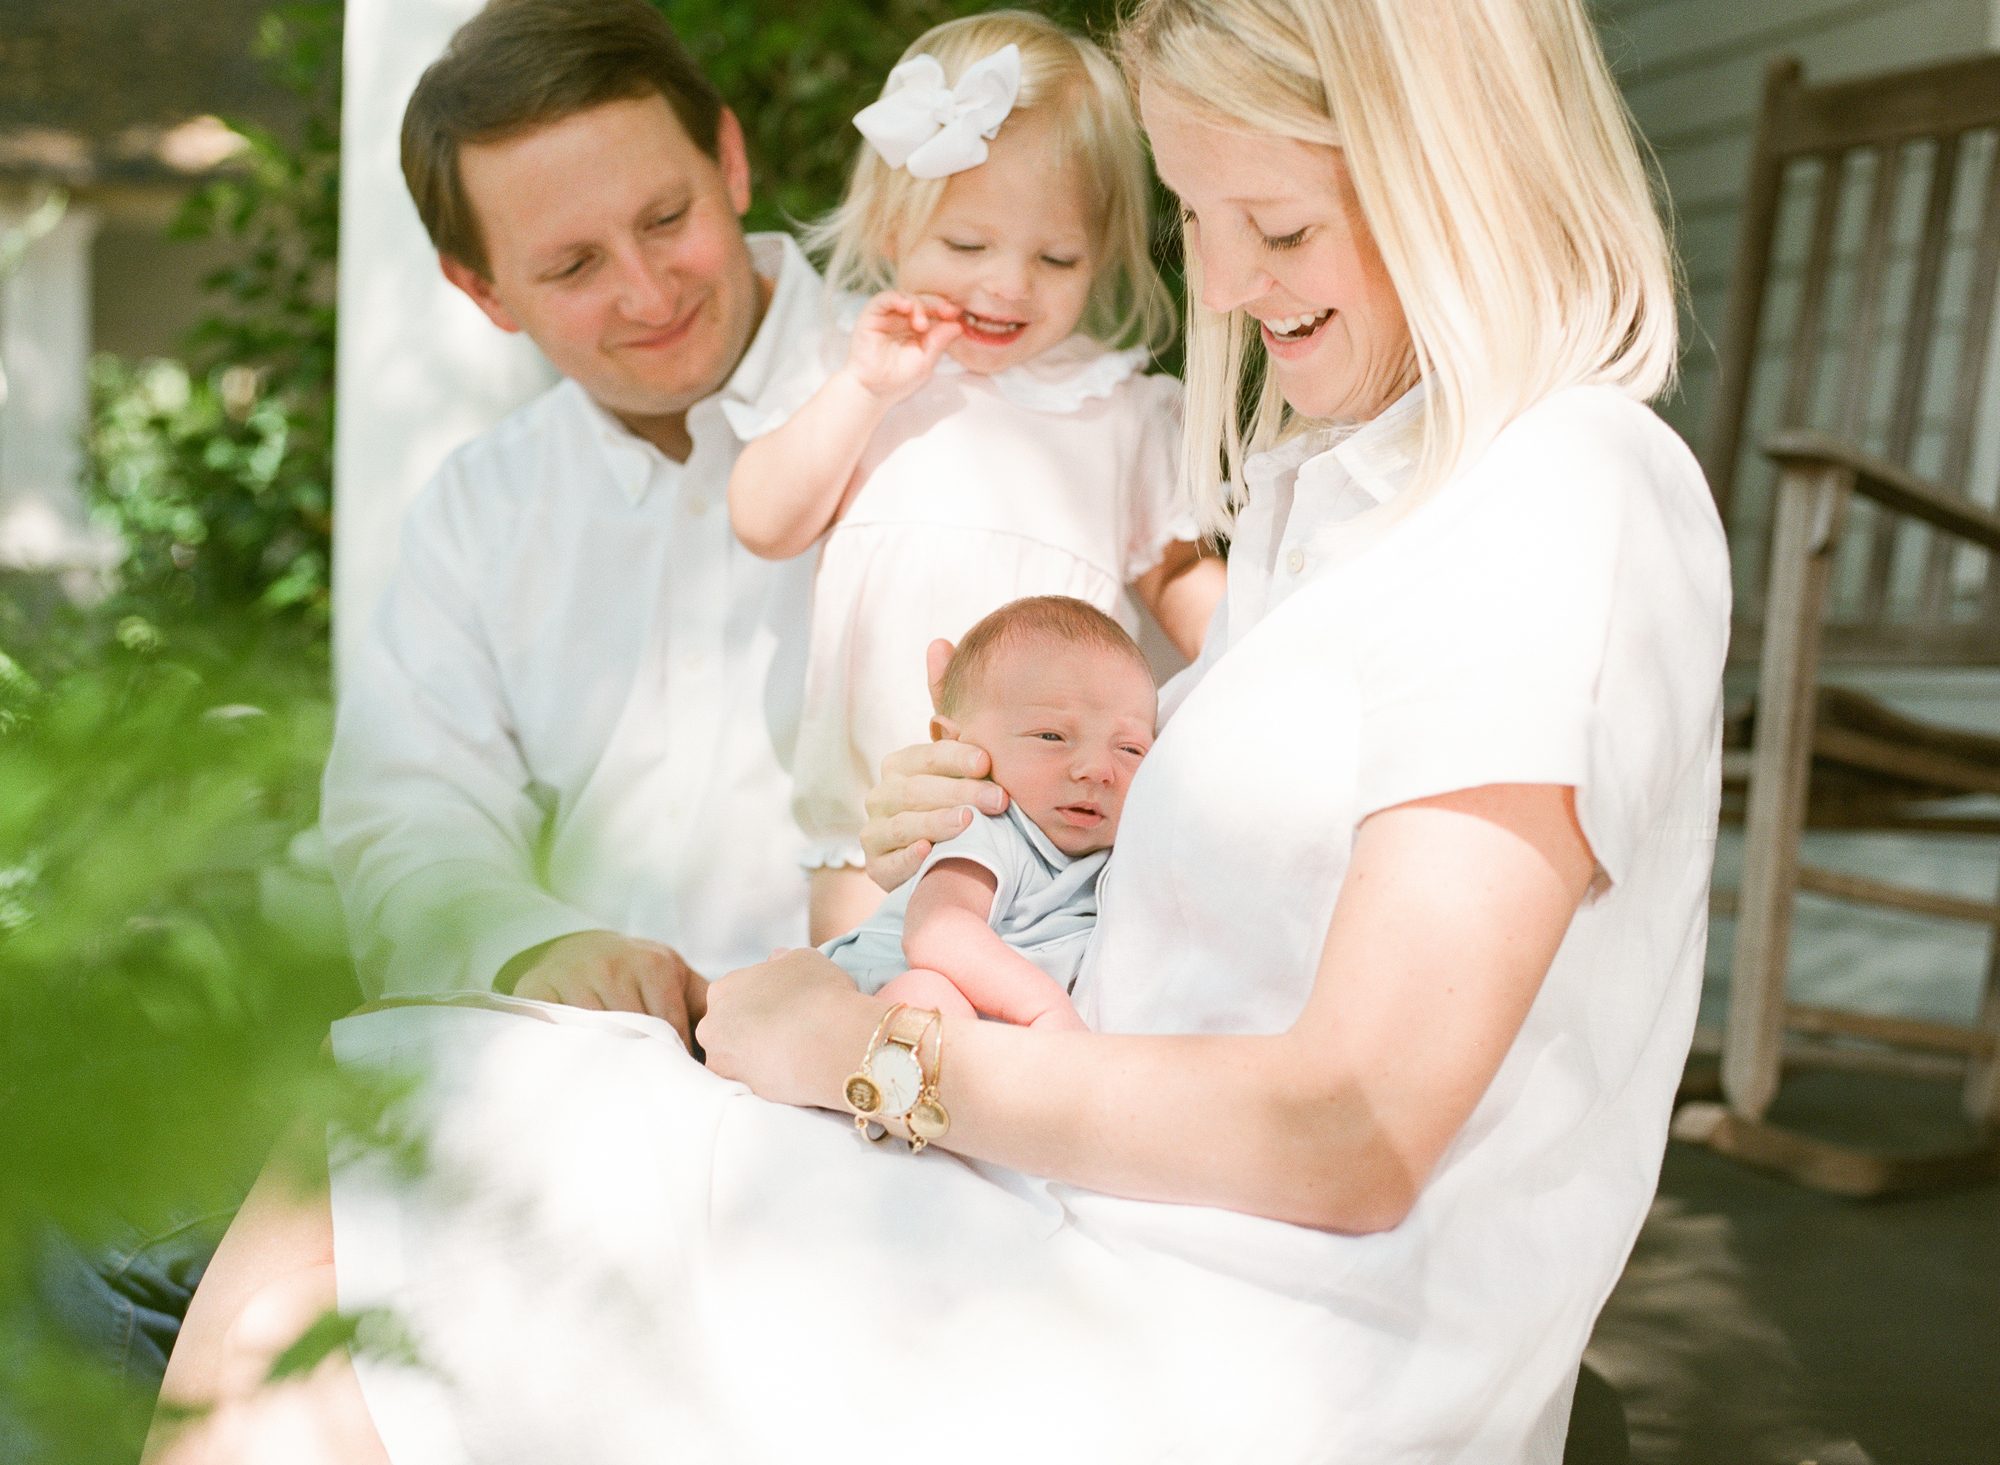 raleigh-baby-photographer-lifestyle-newborn-session